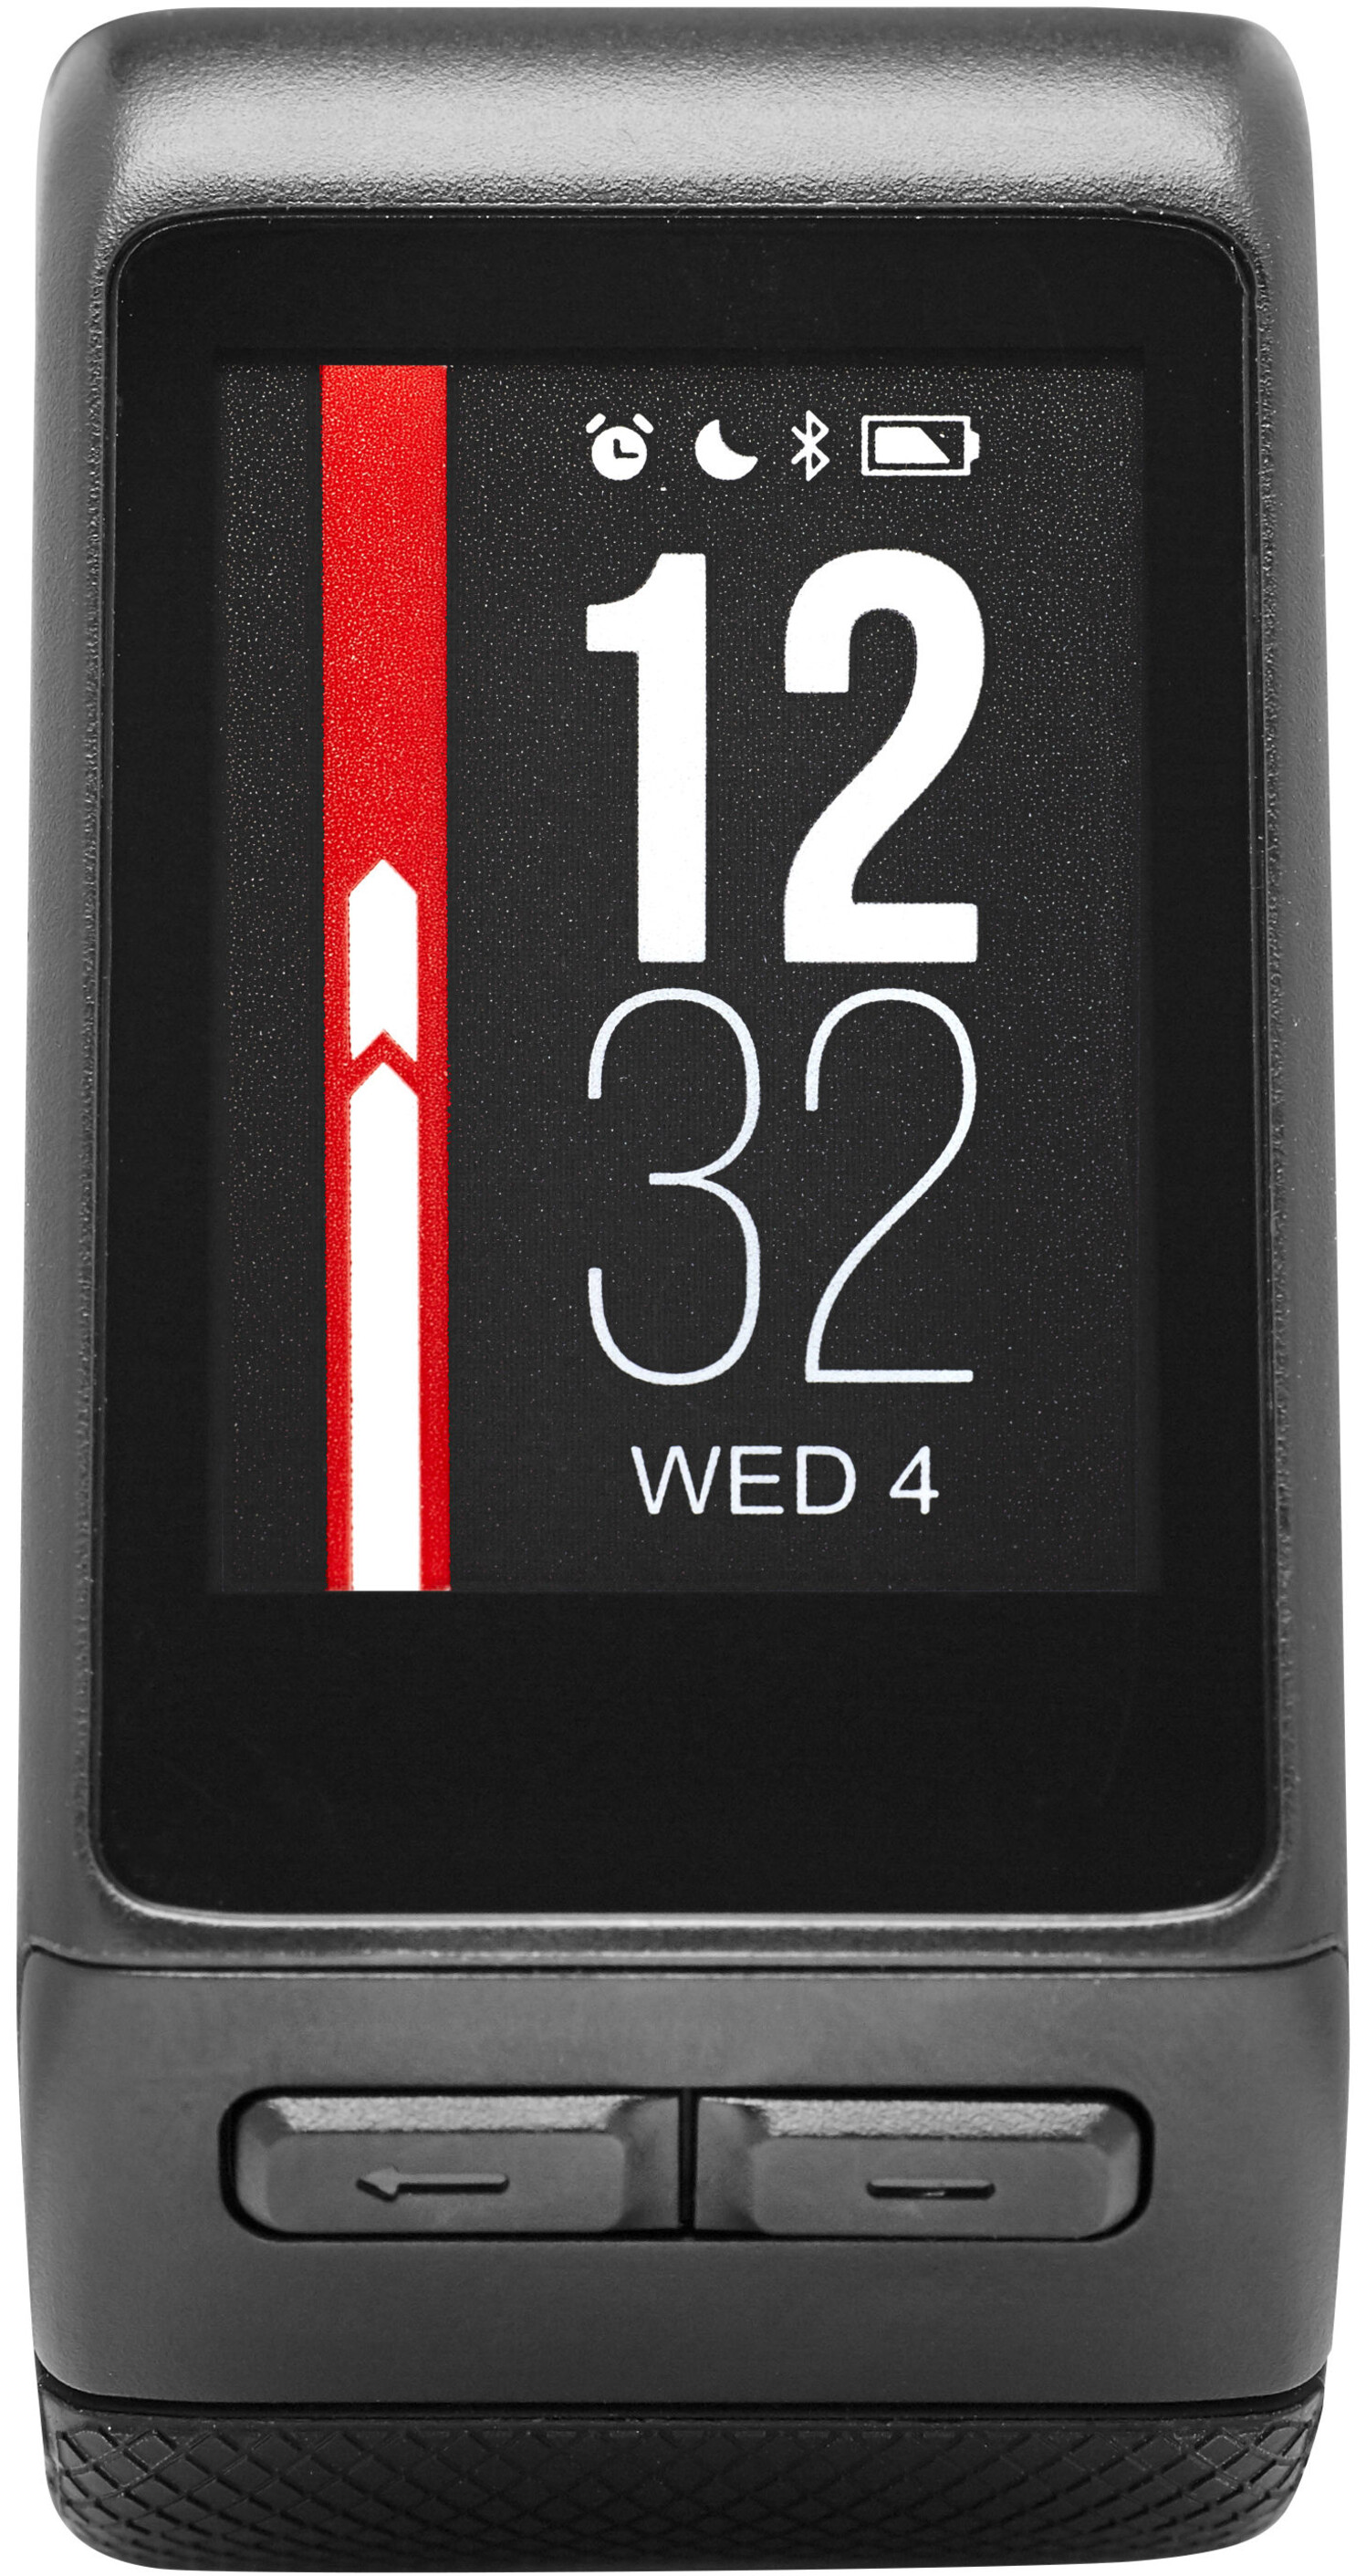 Harga Dan Spek Garmin Vivoactive Hr Terbaru 2018 Longtime Chain Classic 2 Menamp039s Watch Gps Sport Smartwatch Black